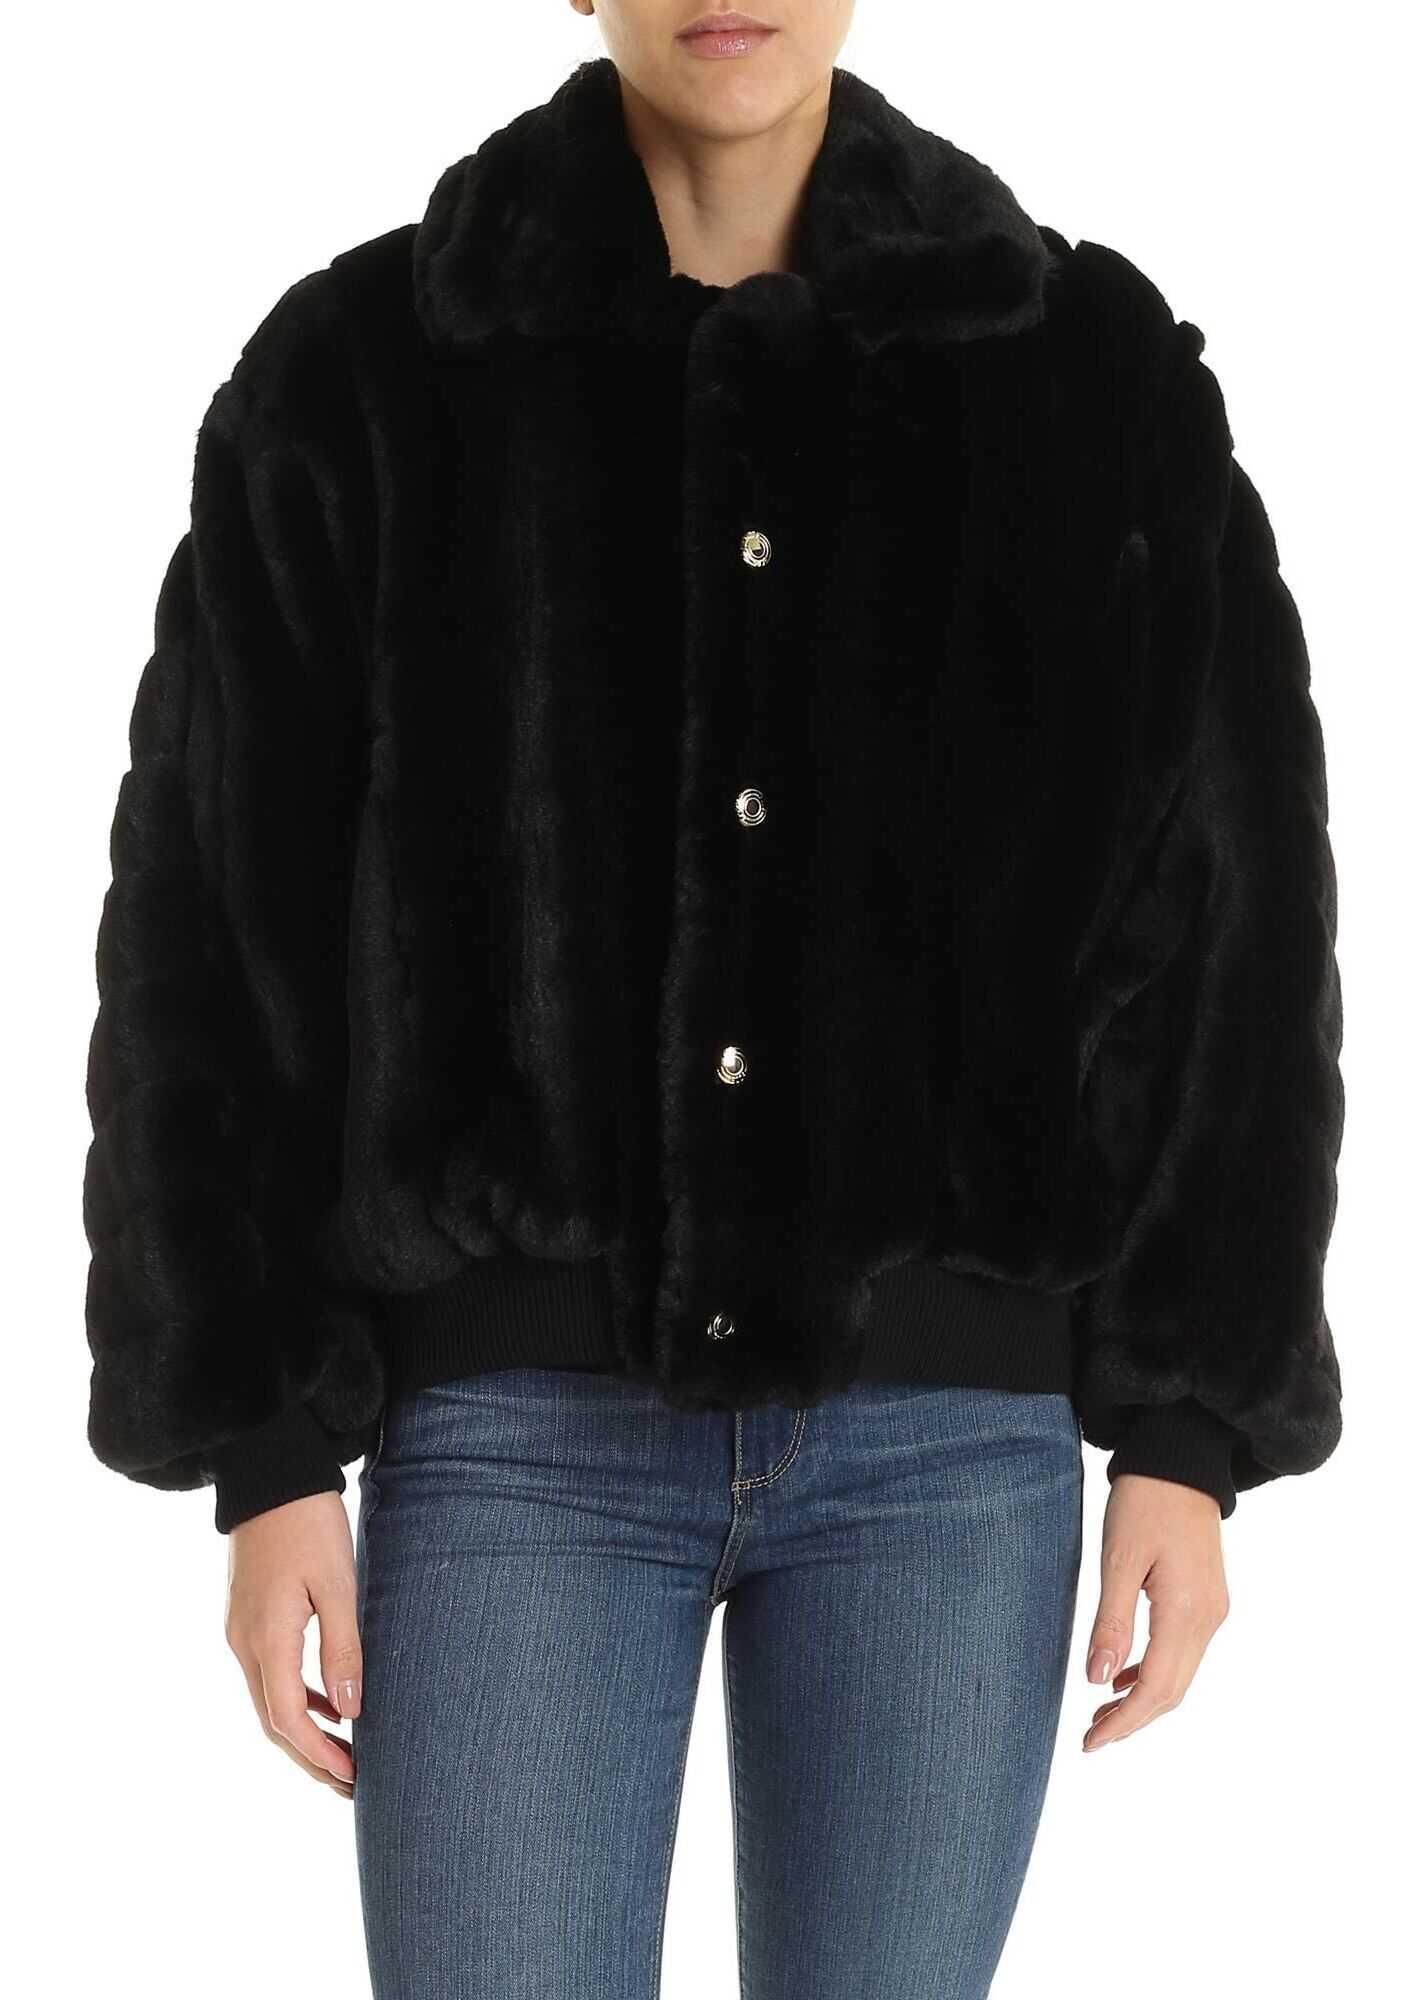 GCDS Black Lined Eco-Fur Black